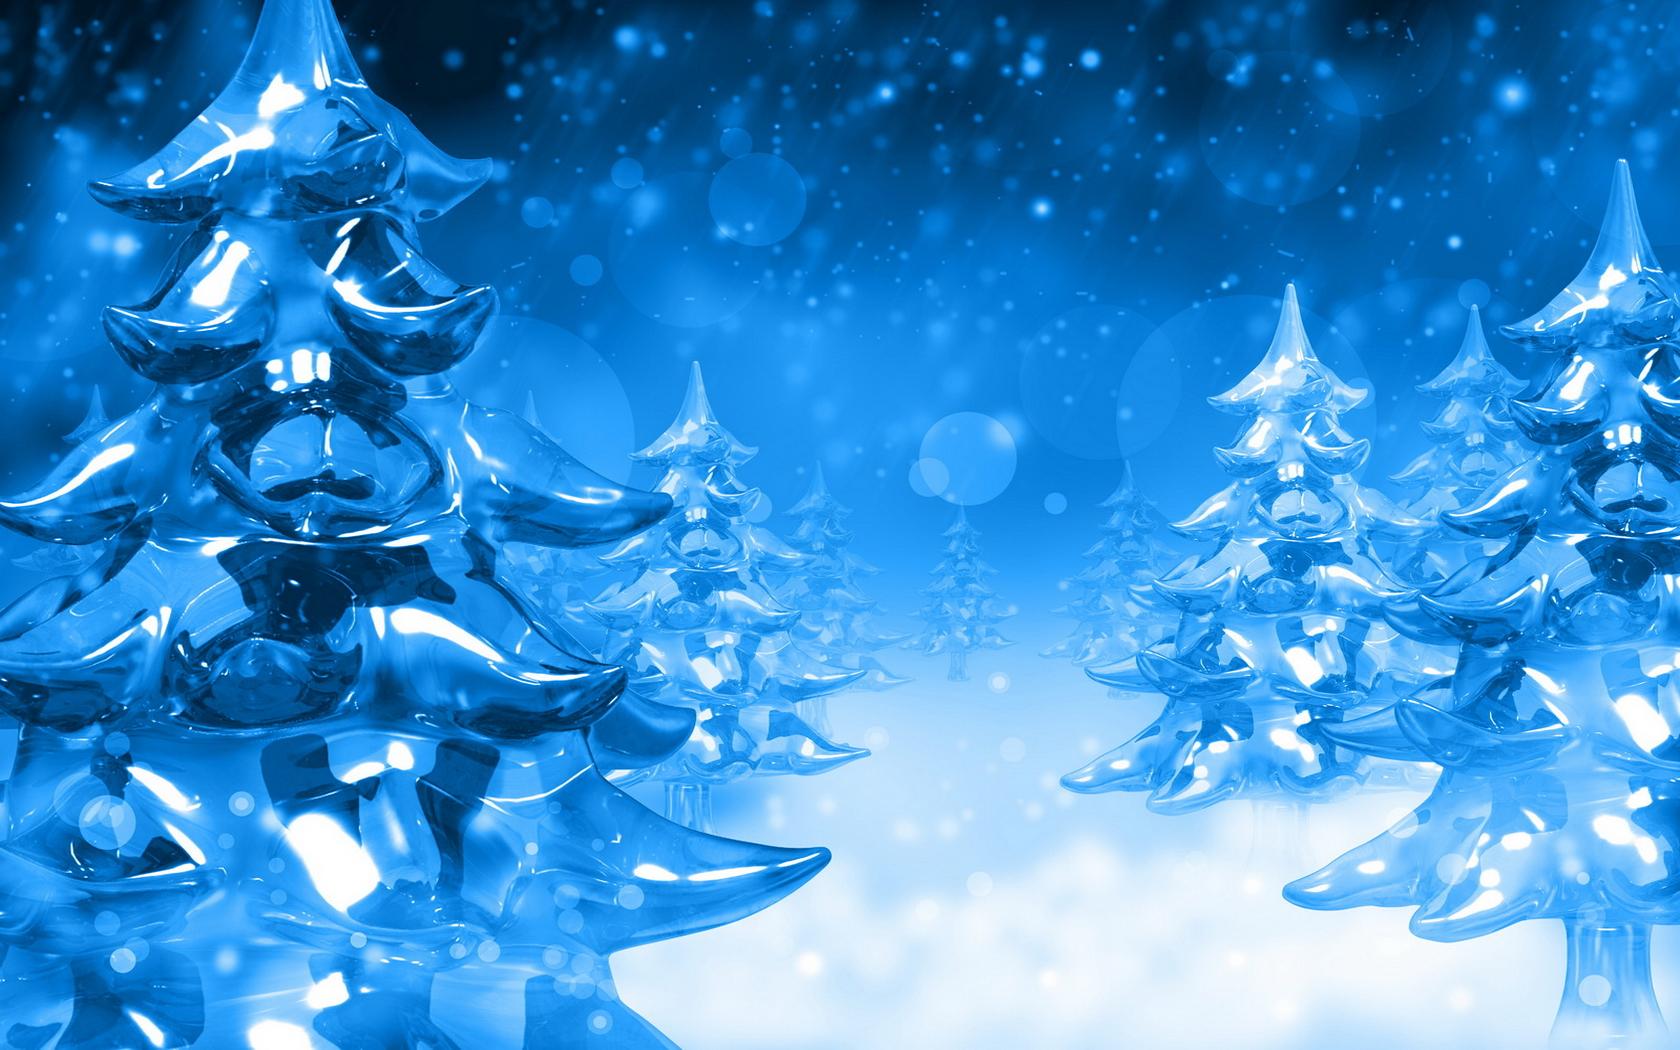 free christmas wallpaper and screensavers 2017 1680x1050